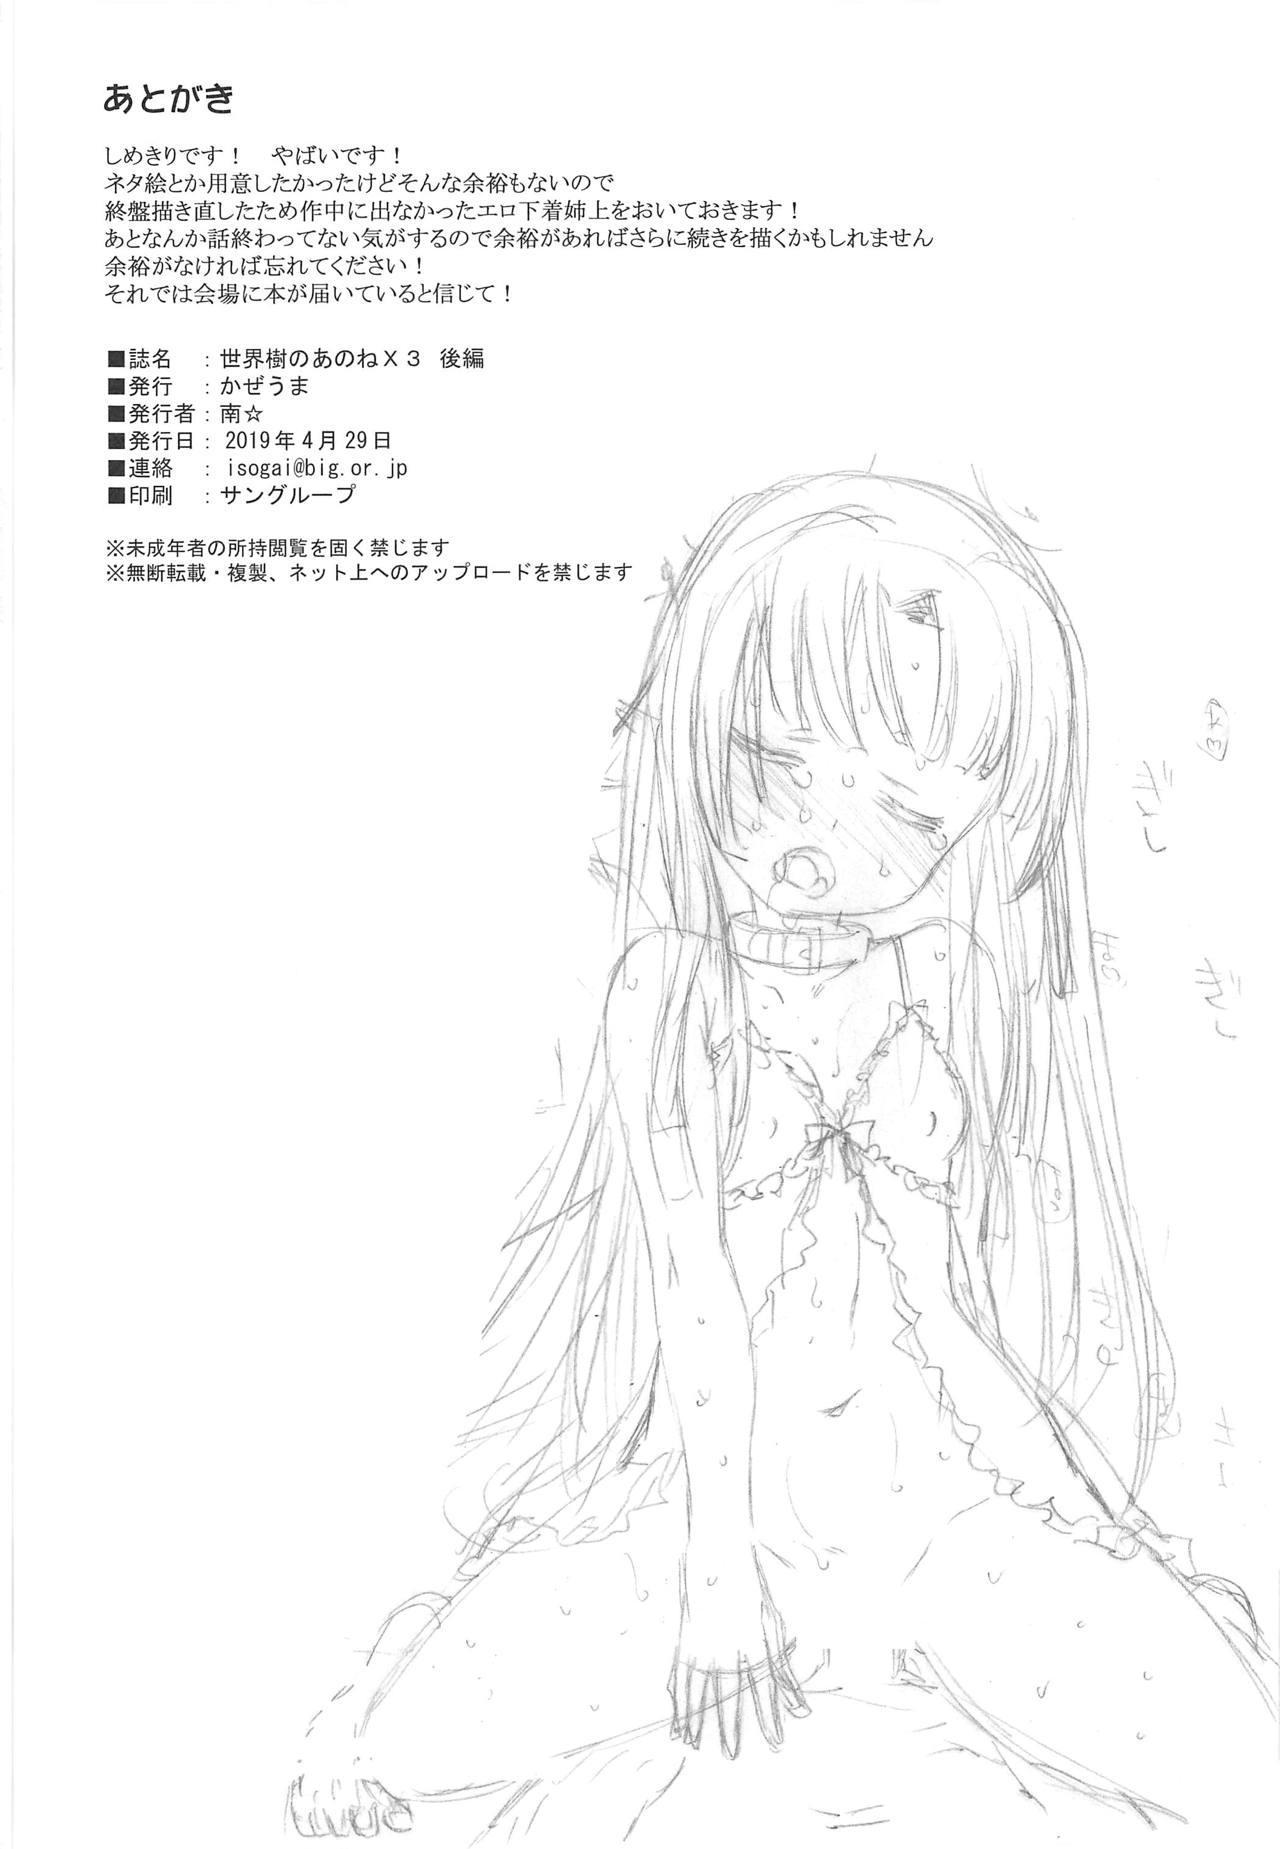 Sekaiju no Anone X3 Kouhen 40